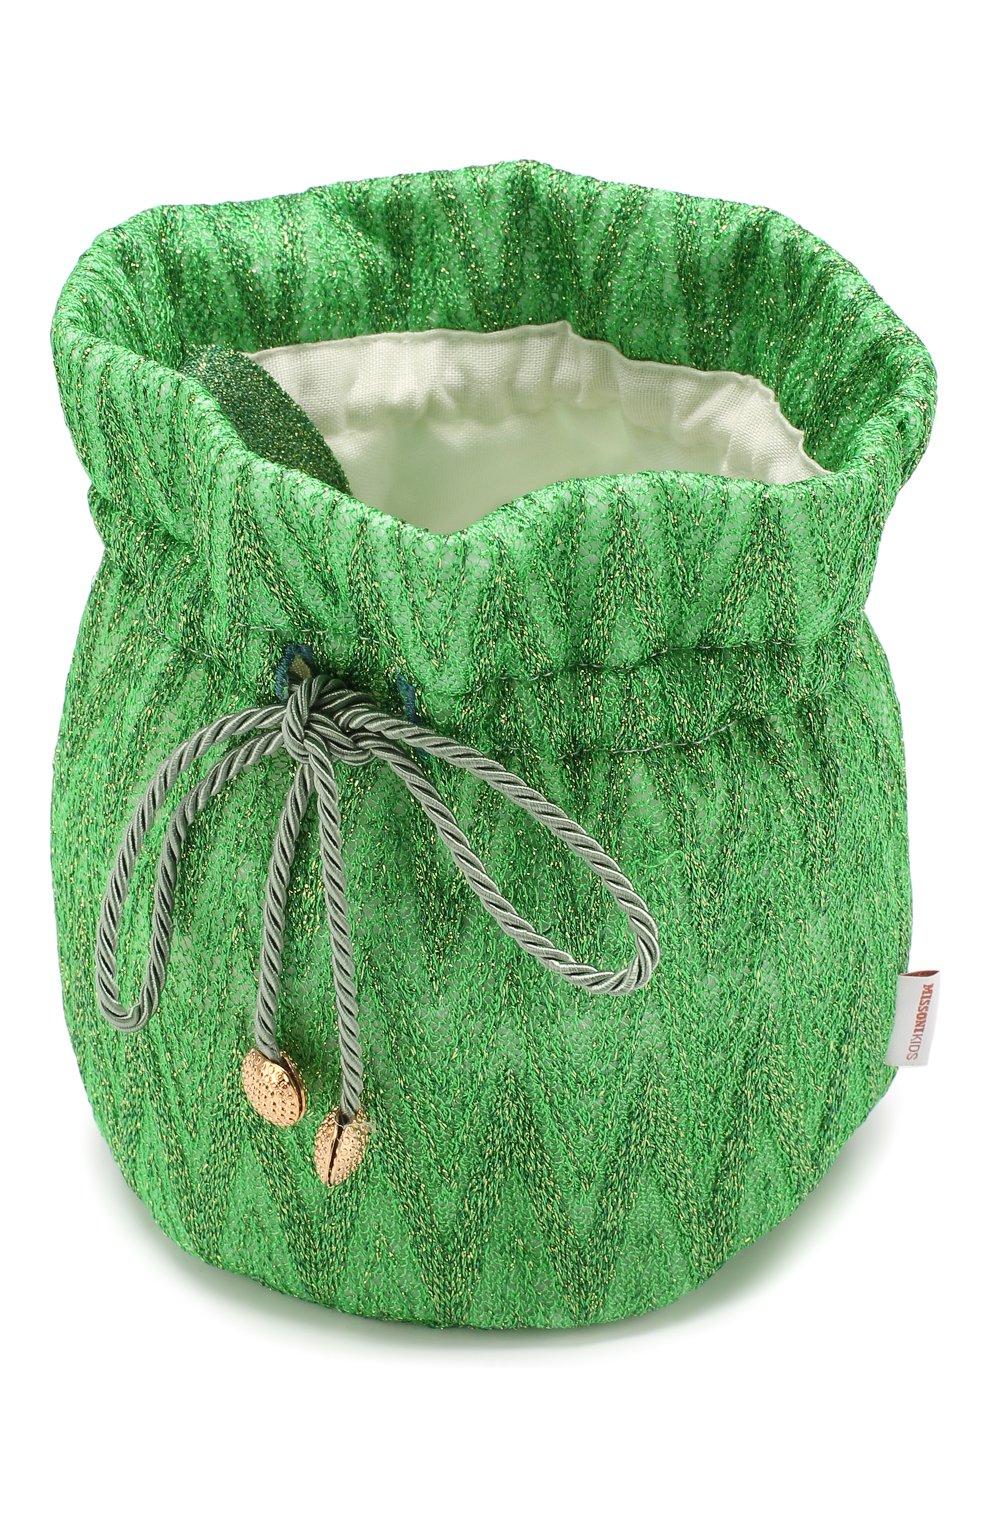 Текстильная сумка | Фото №3